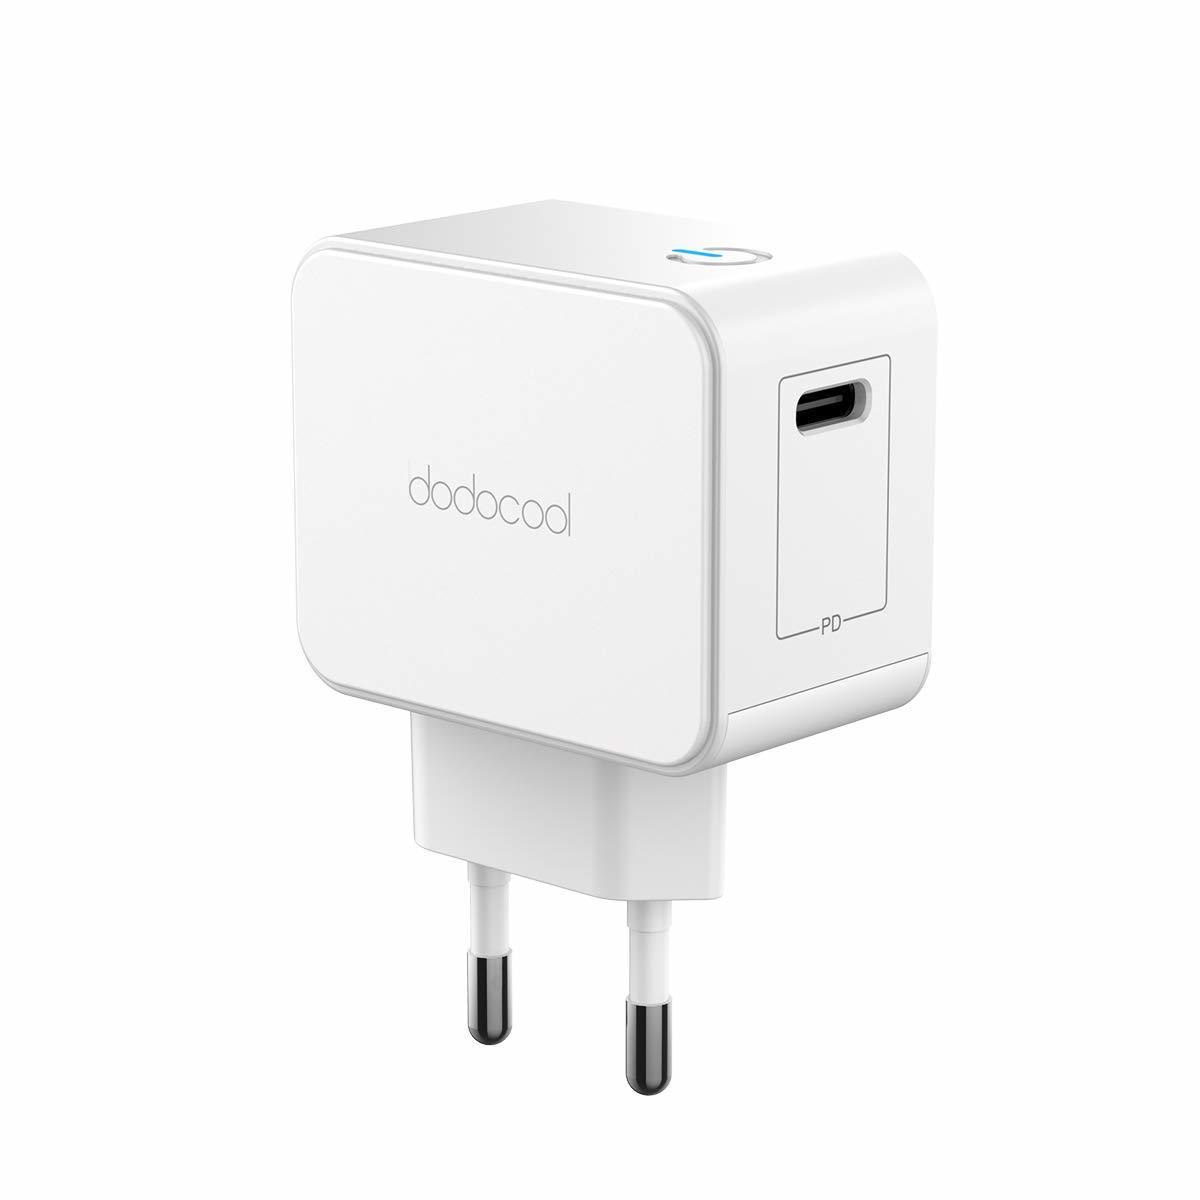 dodocool Chargeur USB Type C